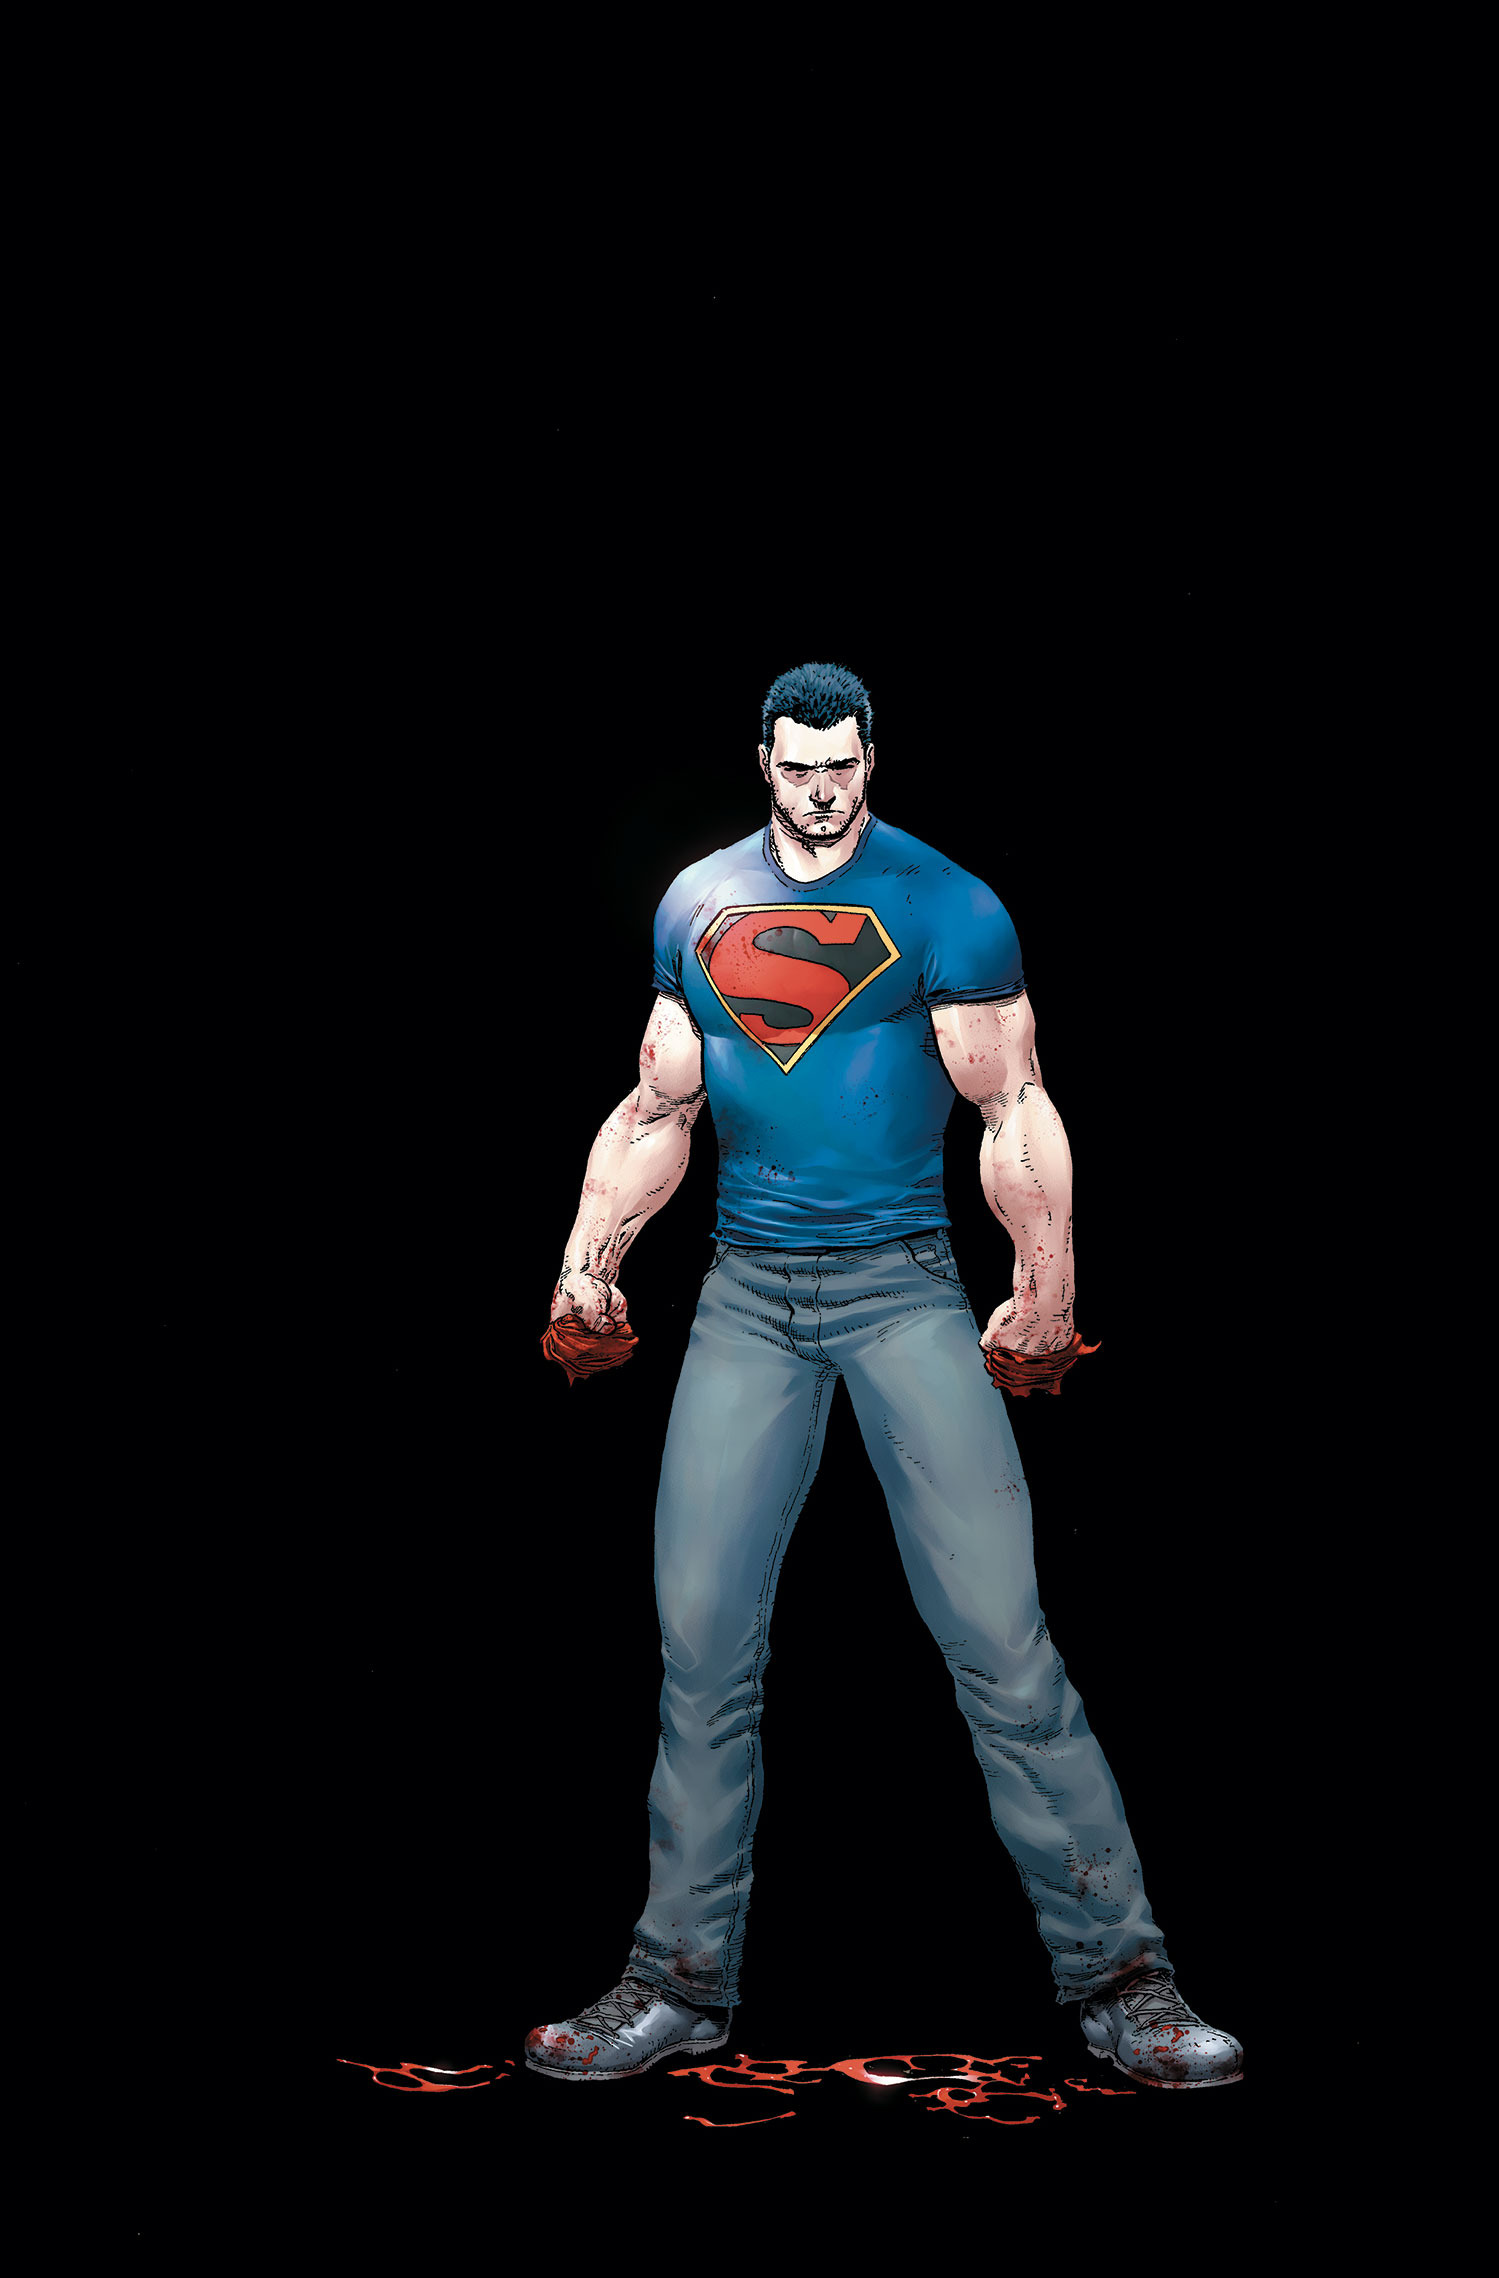 [Encuesta] Qué traje de Superman te gusta más? 8016d4a3461431e1ca60ed5cf0bb7432